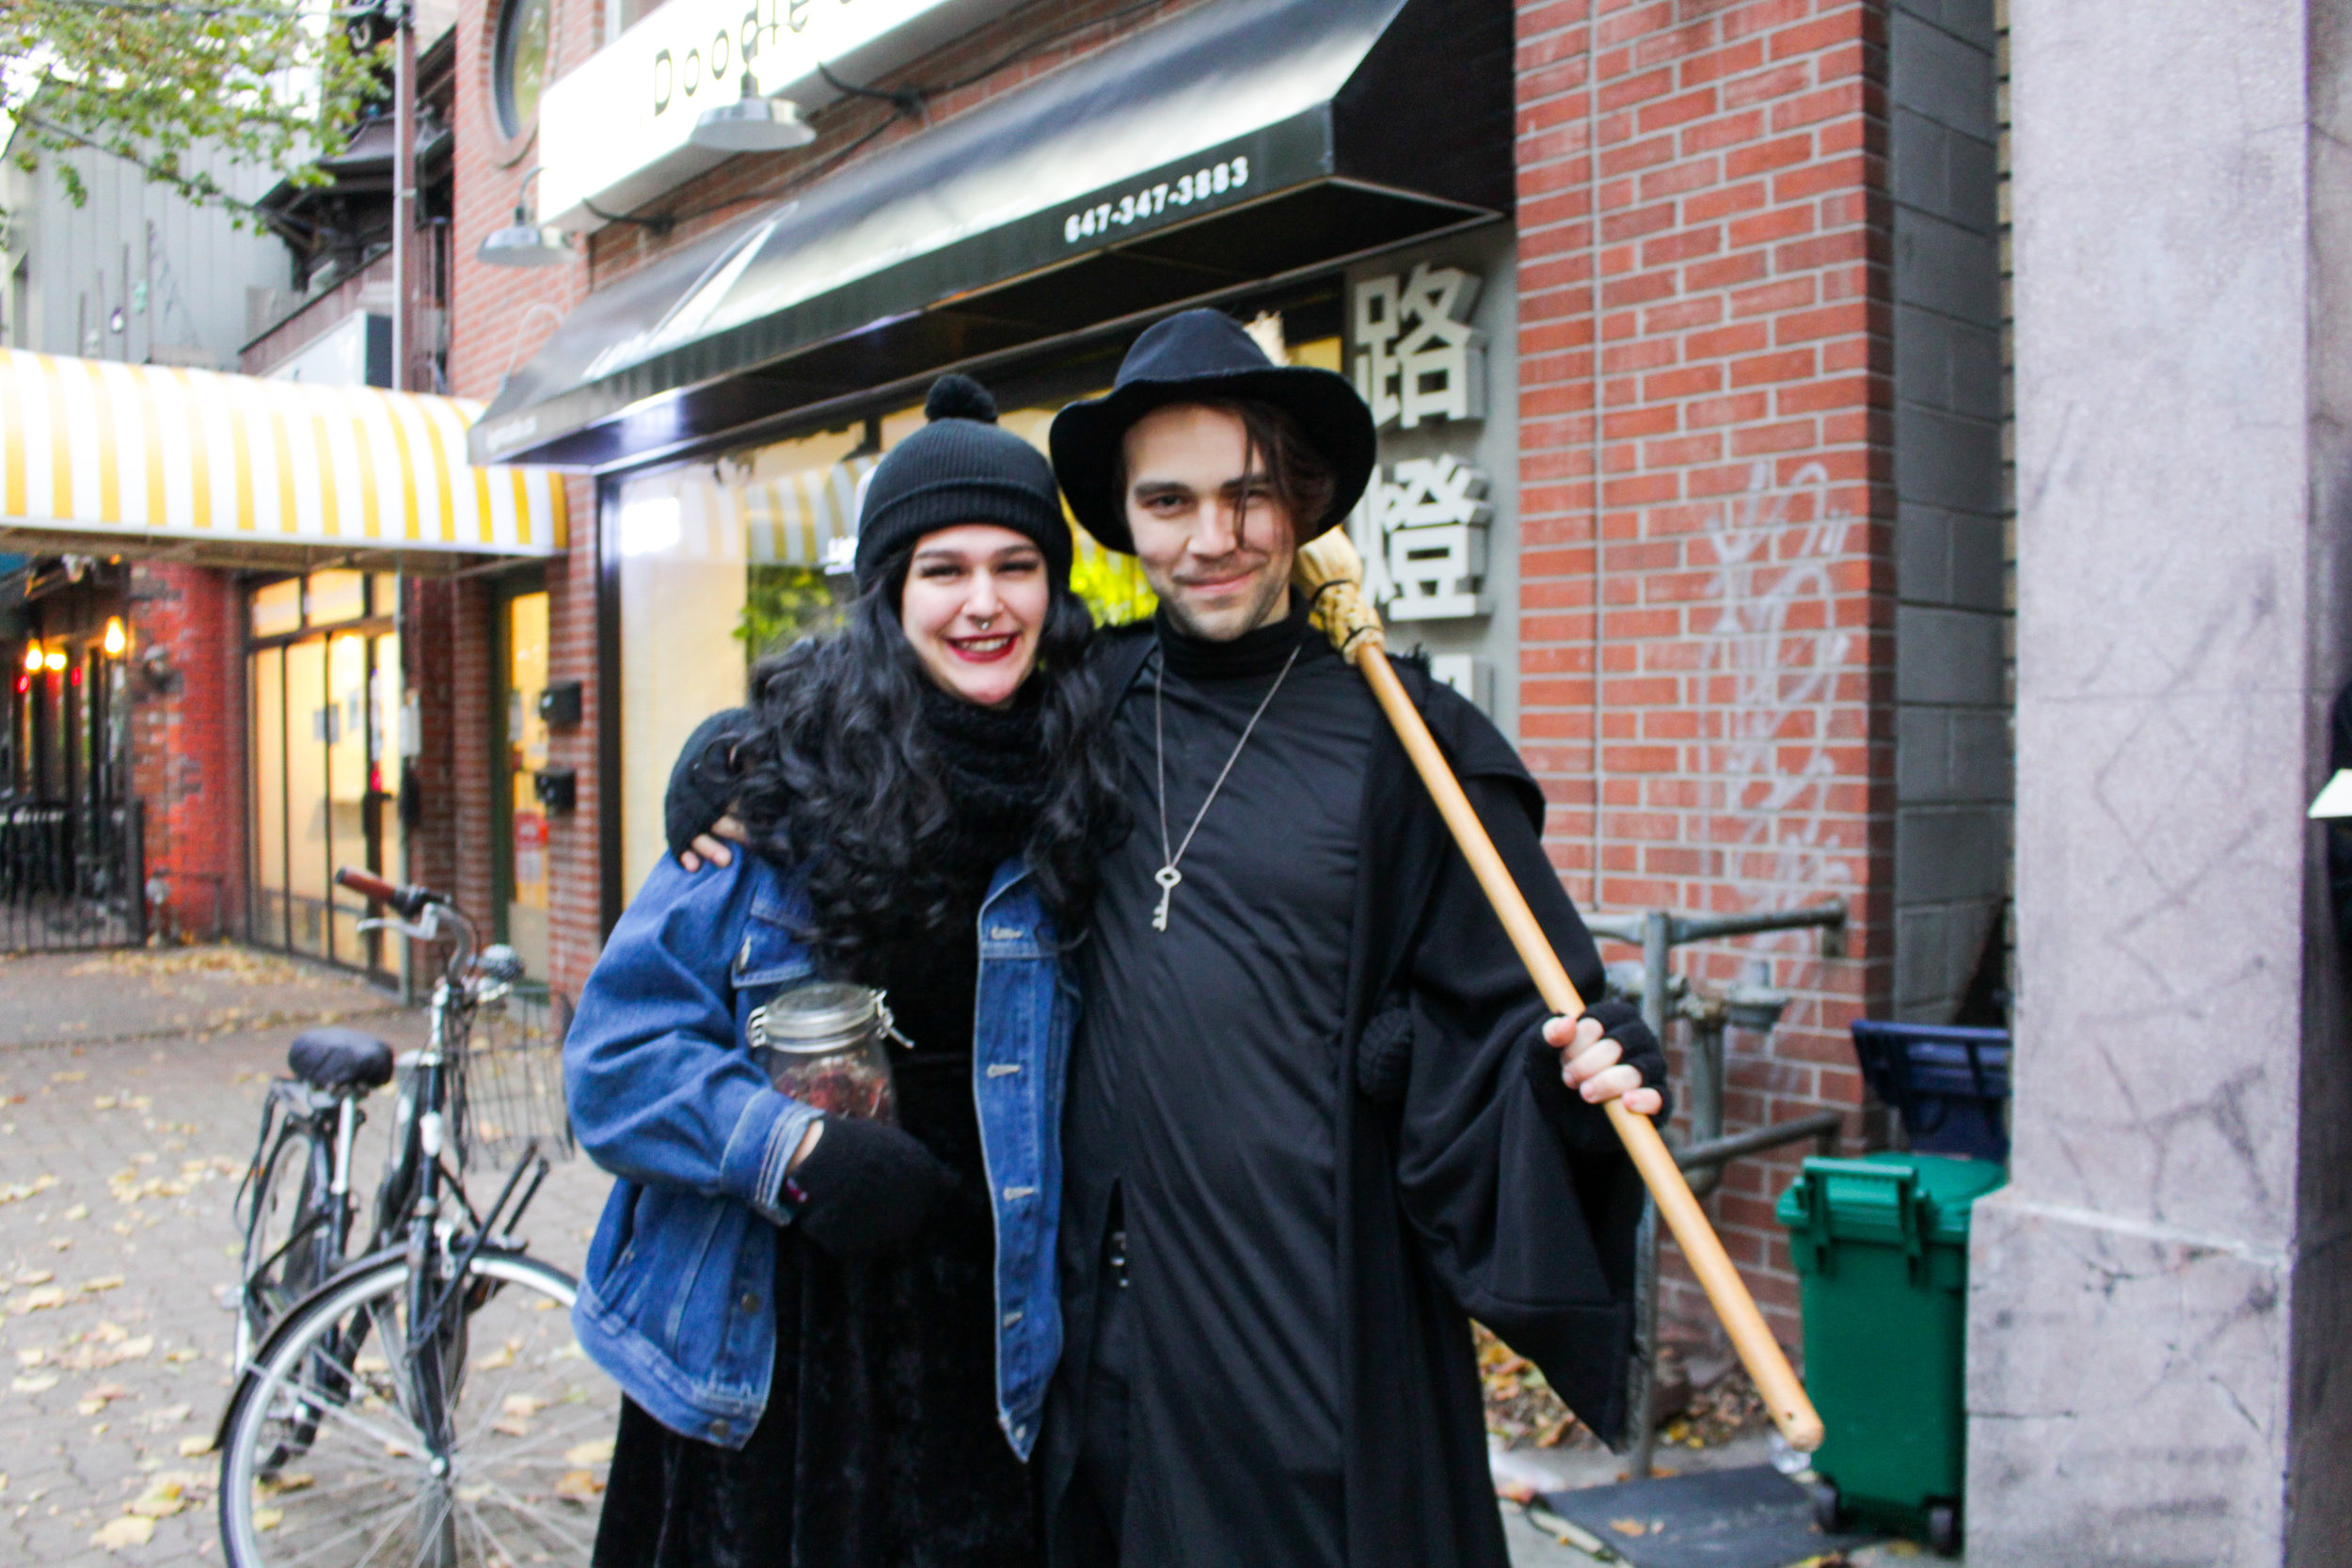 Raquel Ellesmere and Brett Seivwright show off their Witch pride (D. Dejene).